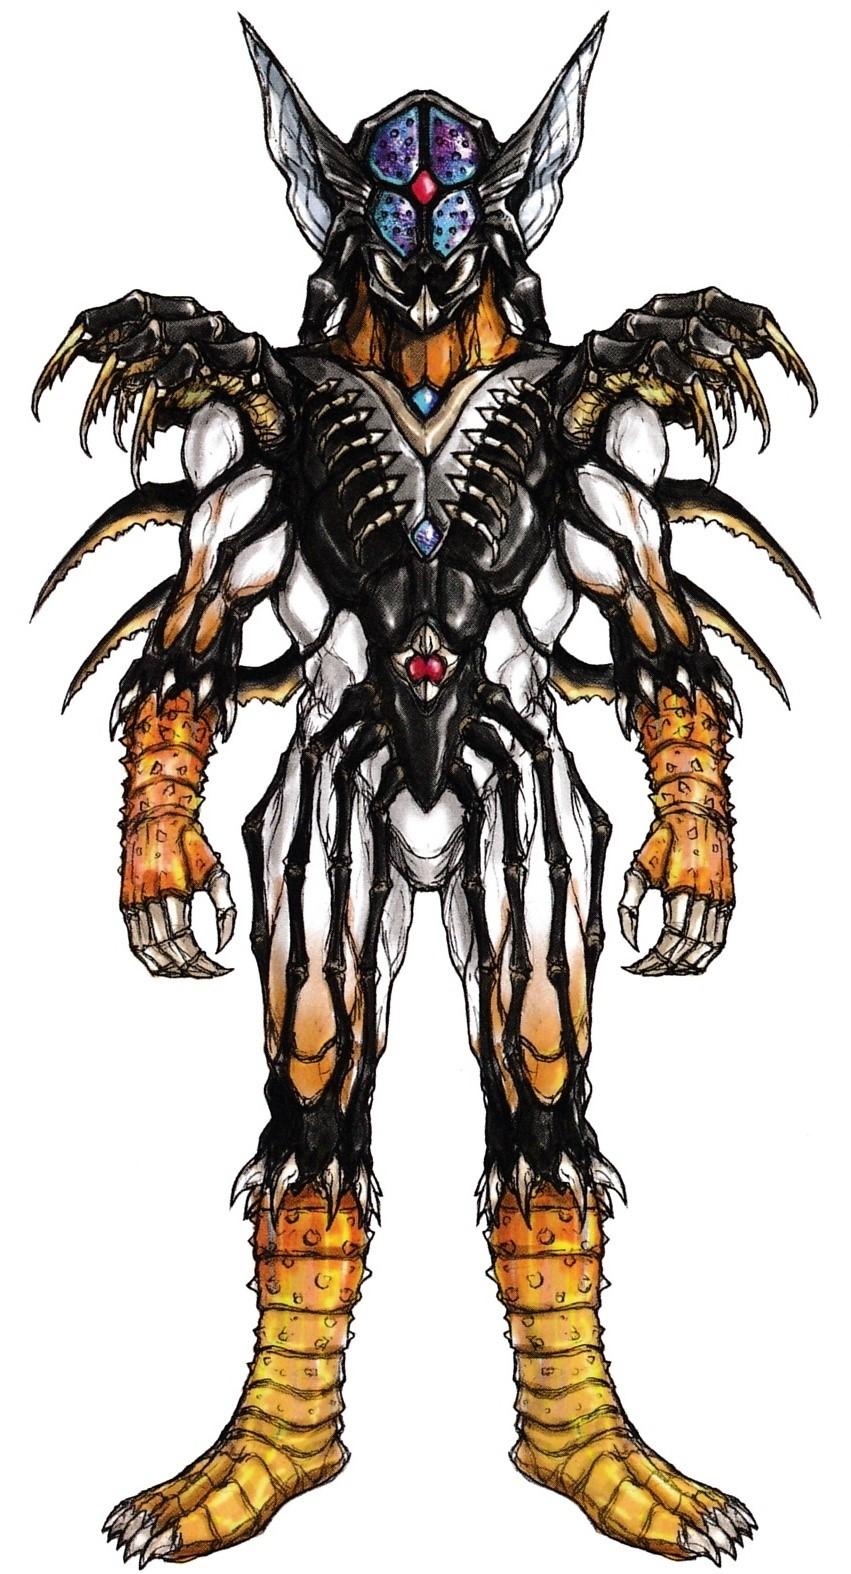 Arachne concept art